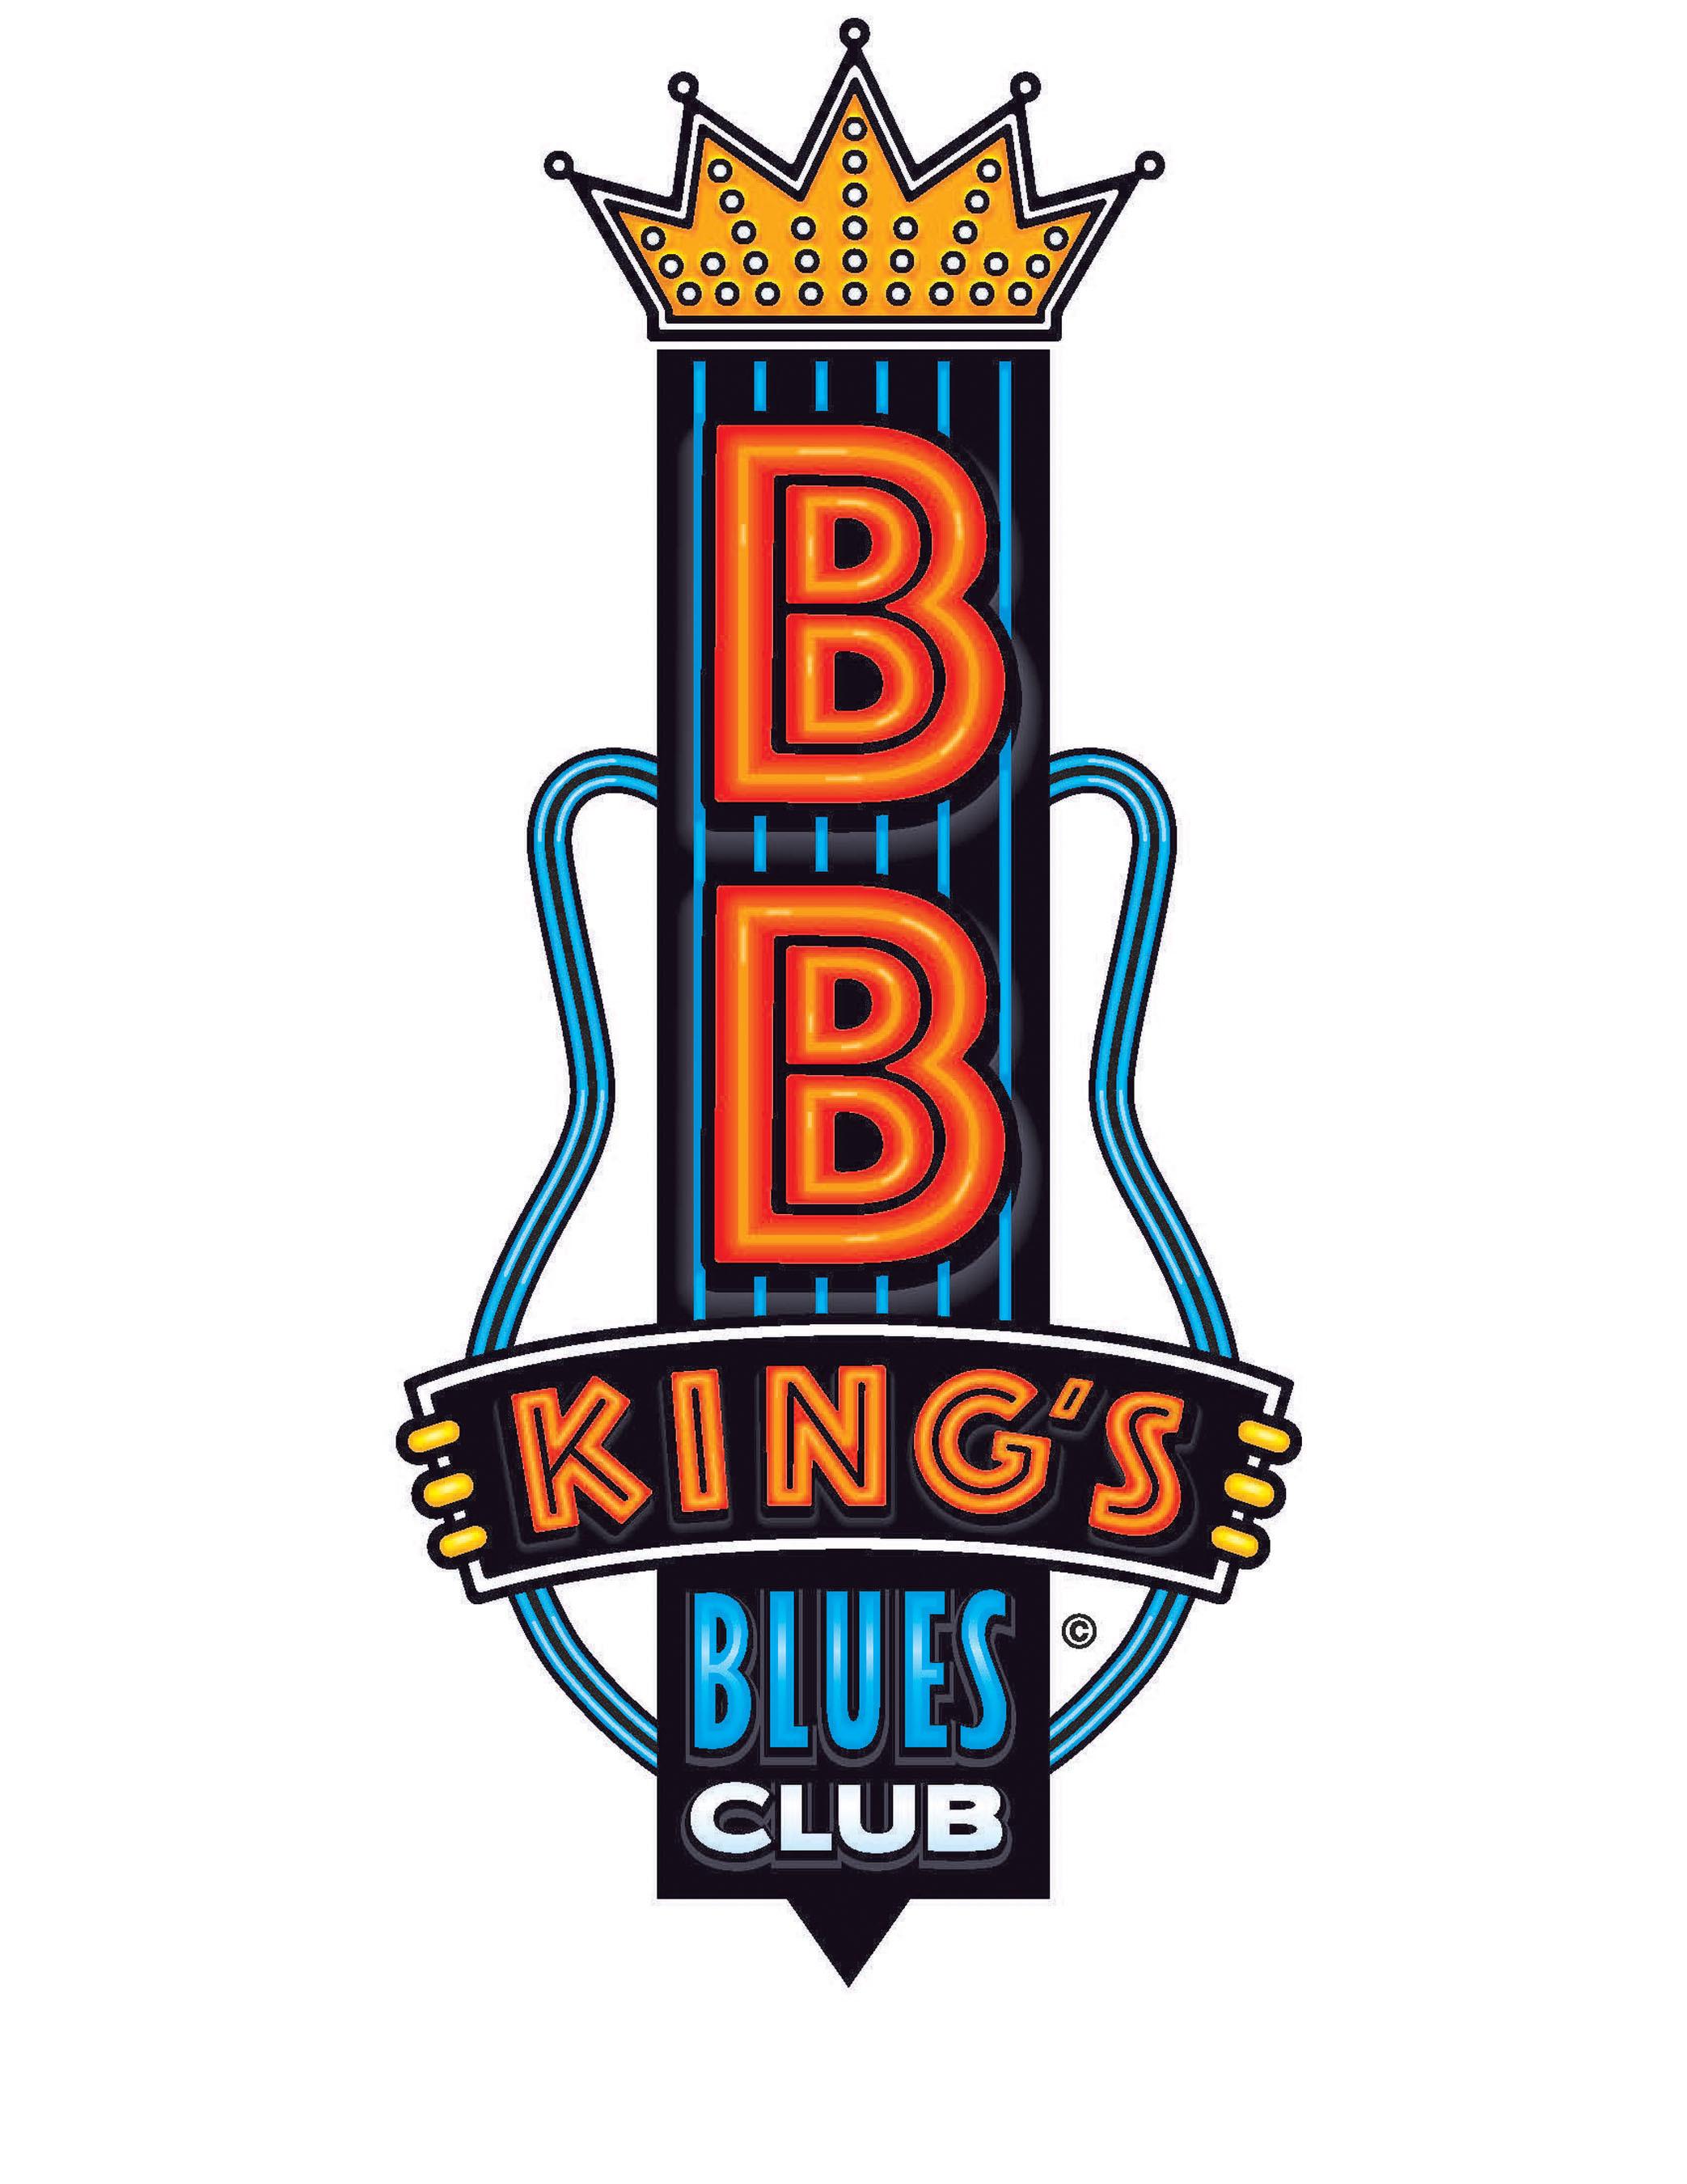 B.B. King's Blues Club.